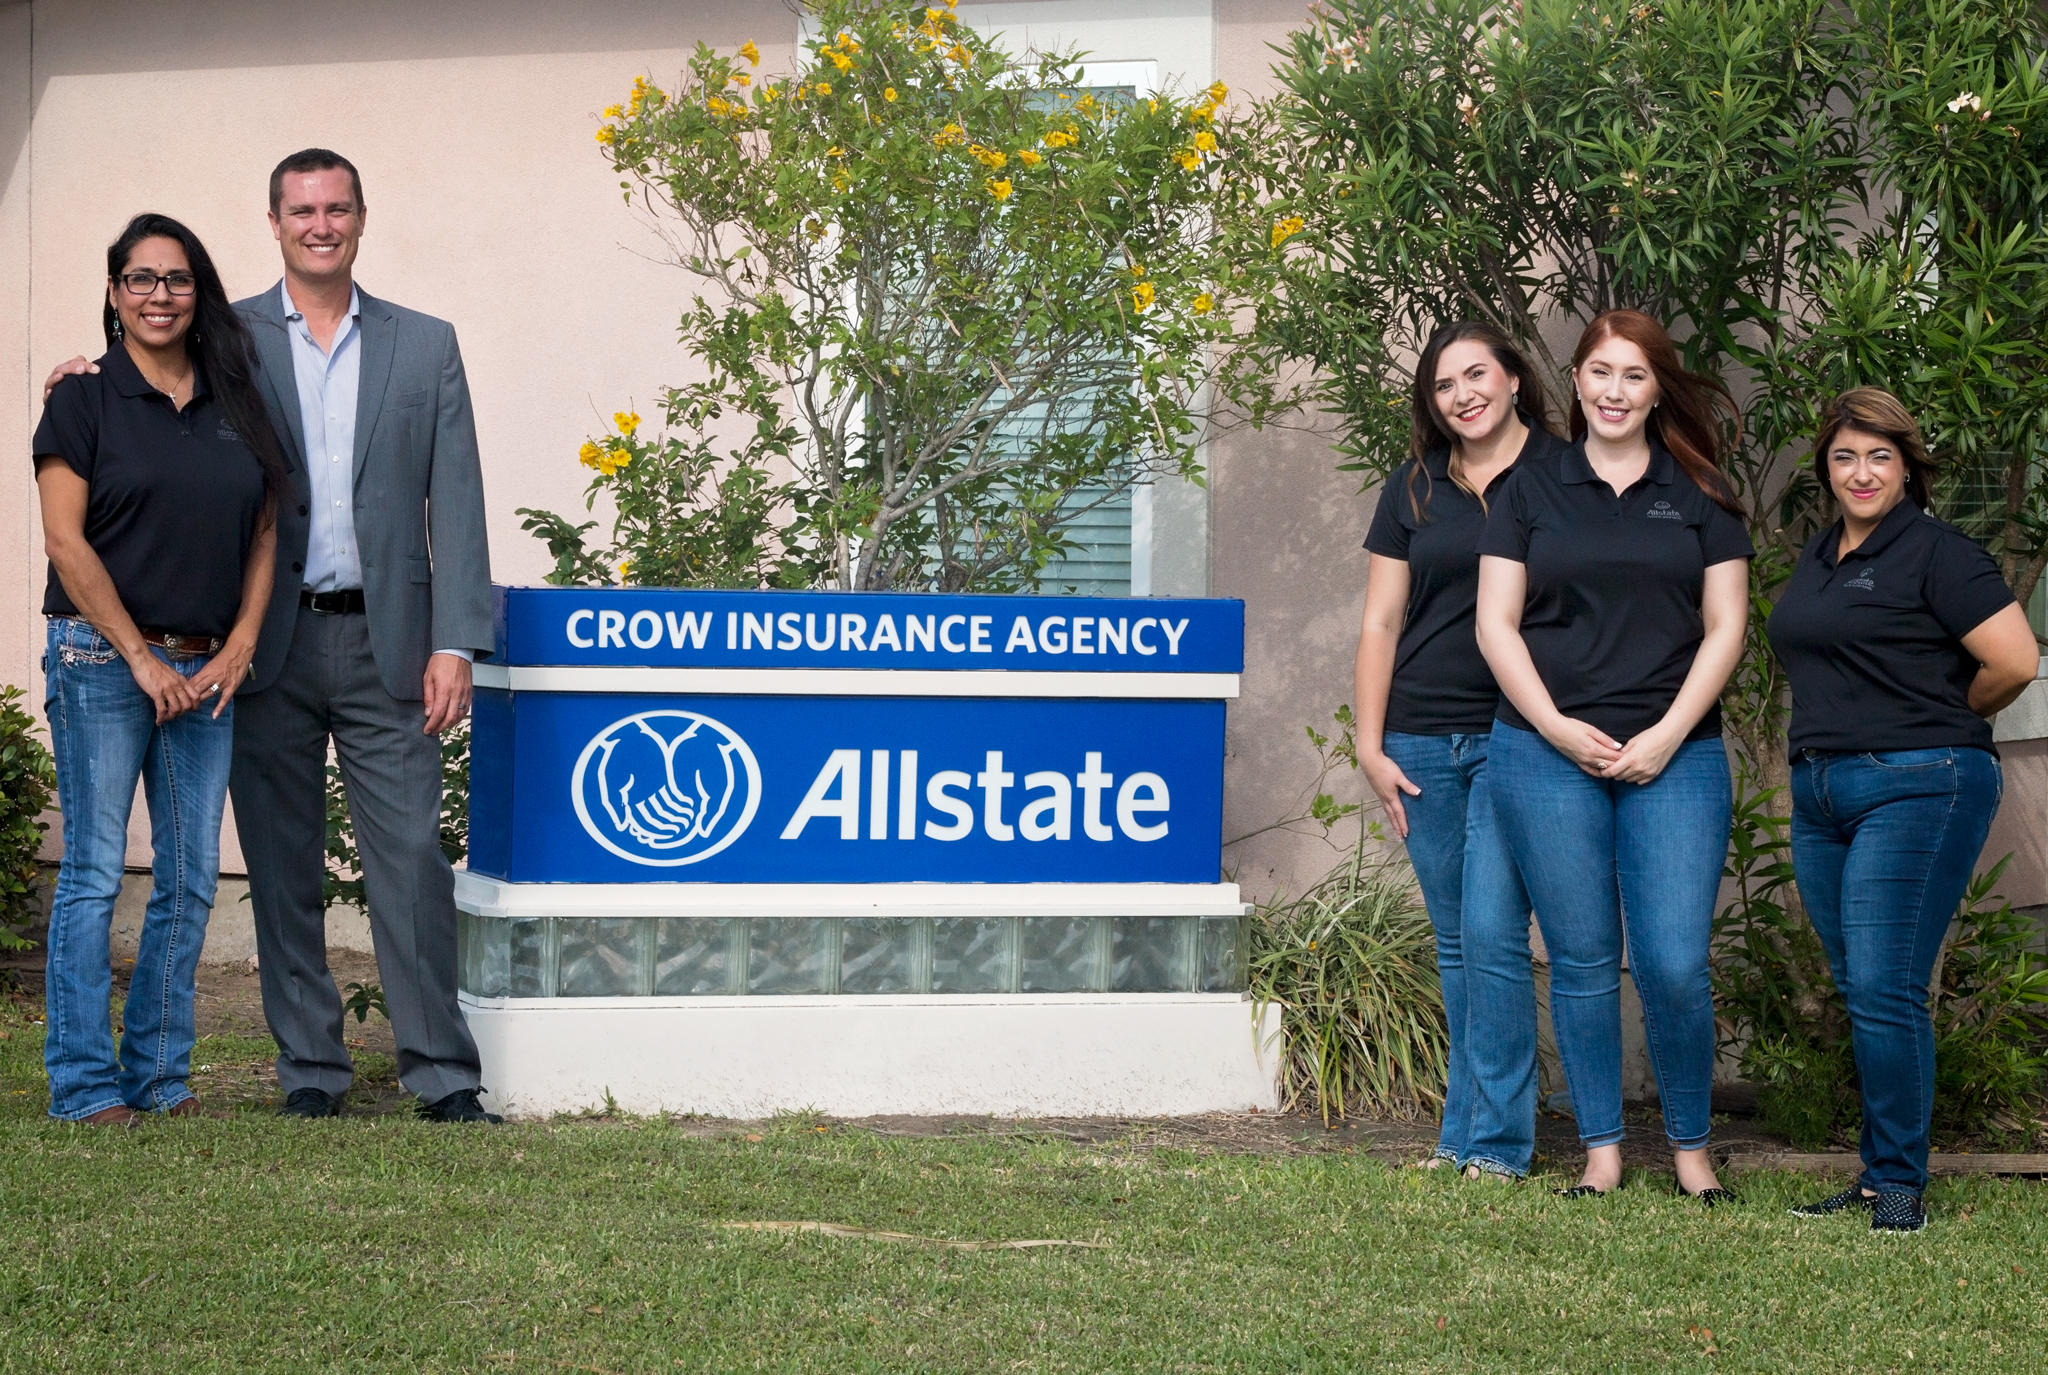 Joshua D. Crow: Allstate Insurance image 1